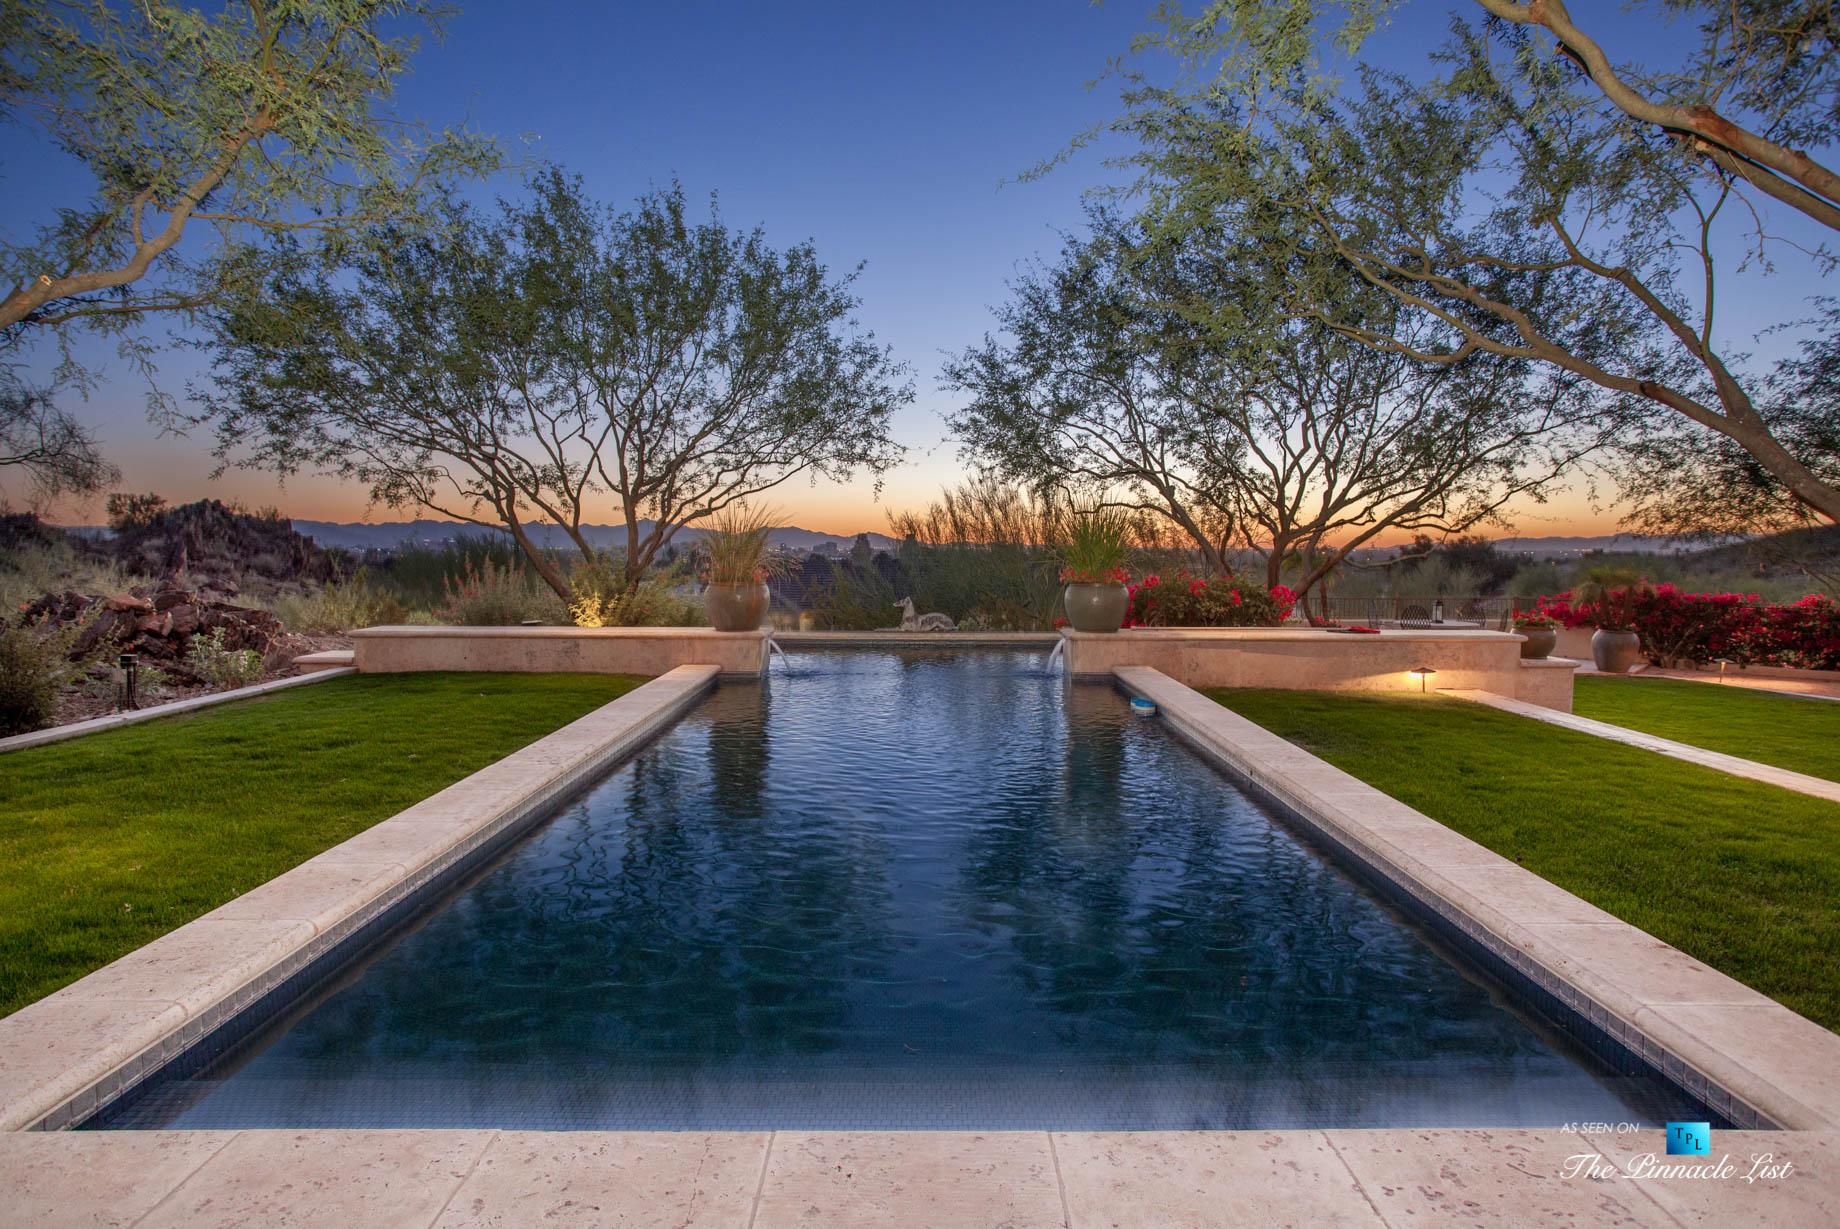 6539 N 31st Pl, Phoenix, AZ, USA – Back Yard Pool Sunset – Luxury Real Estate – Biltmore Mountain Estates – Spanish Colonial Home